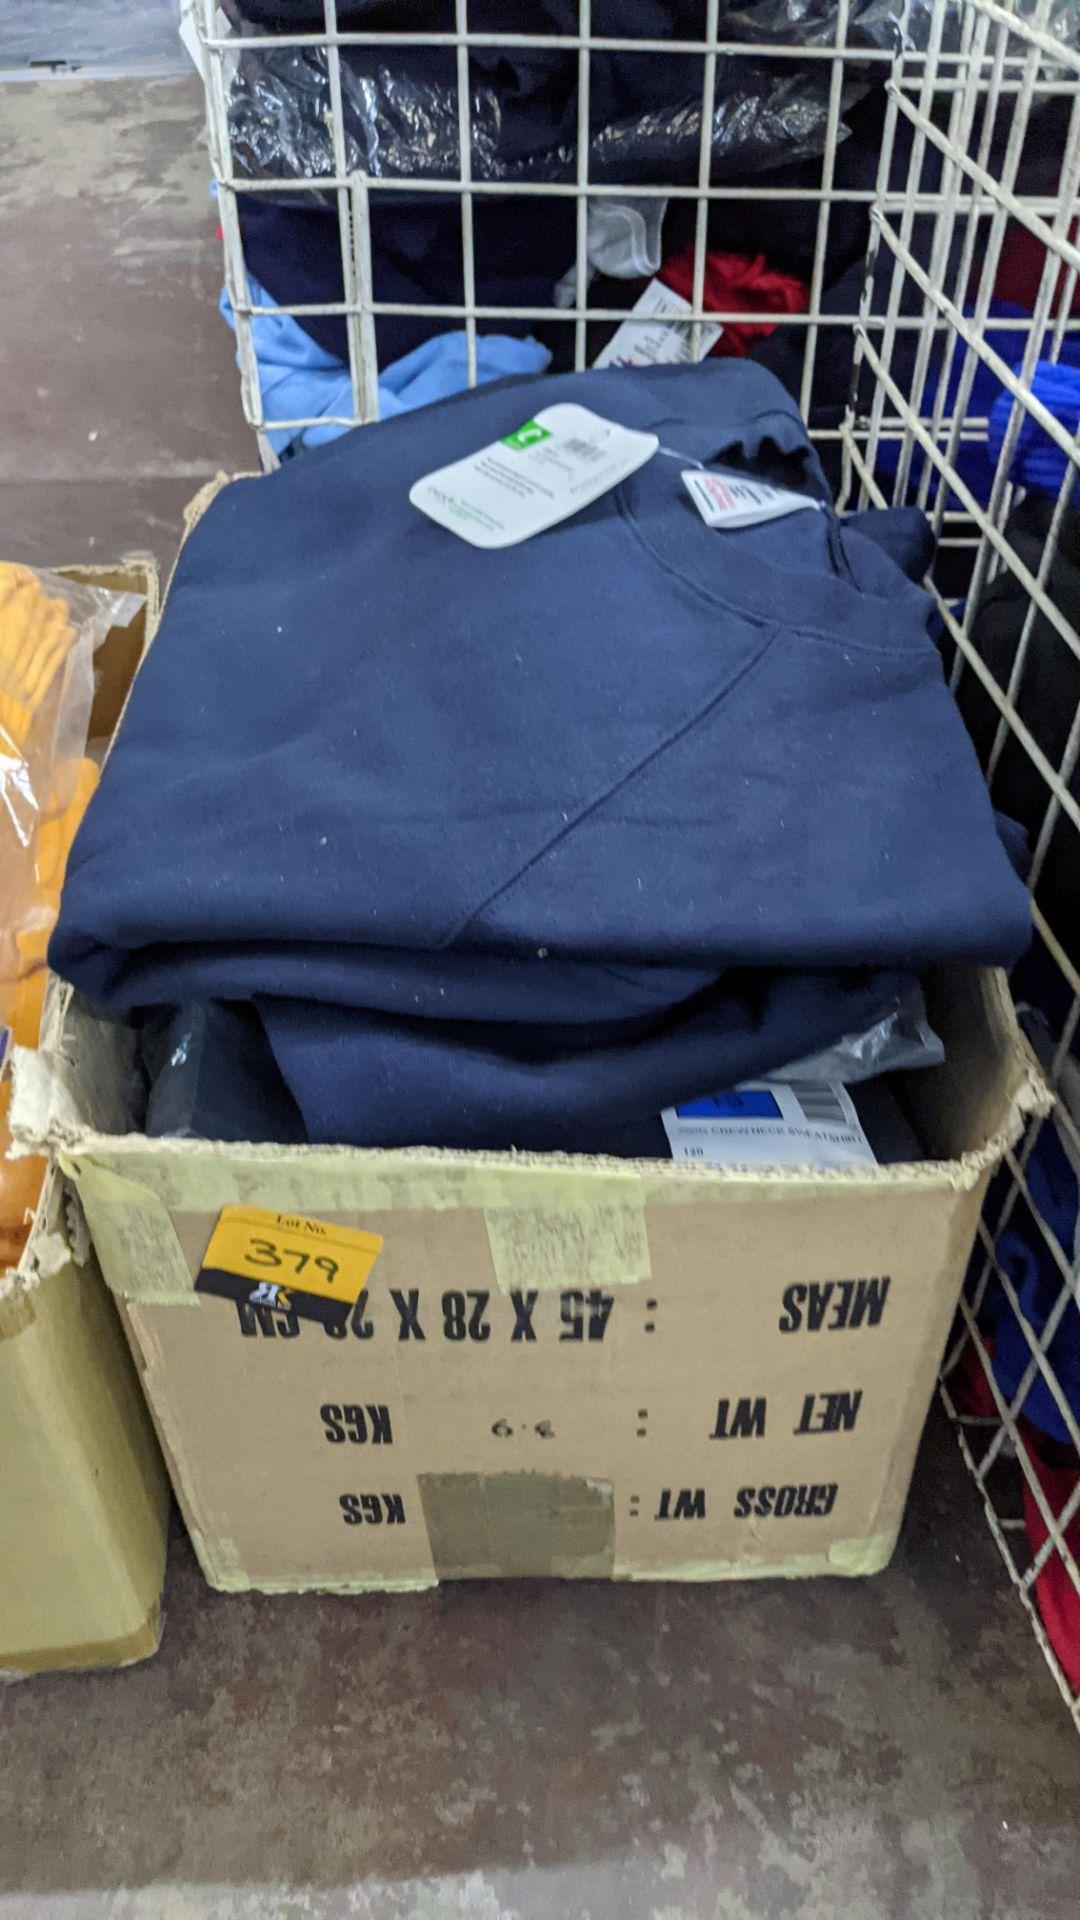 Approx 16 off assorted navy Trutex children's sweatshirts